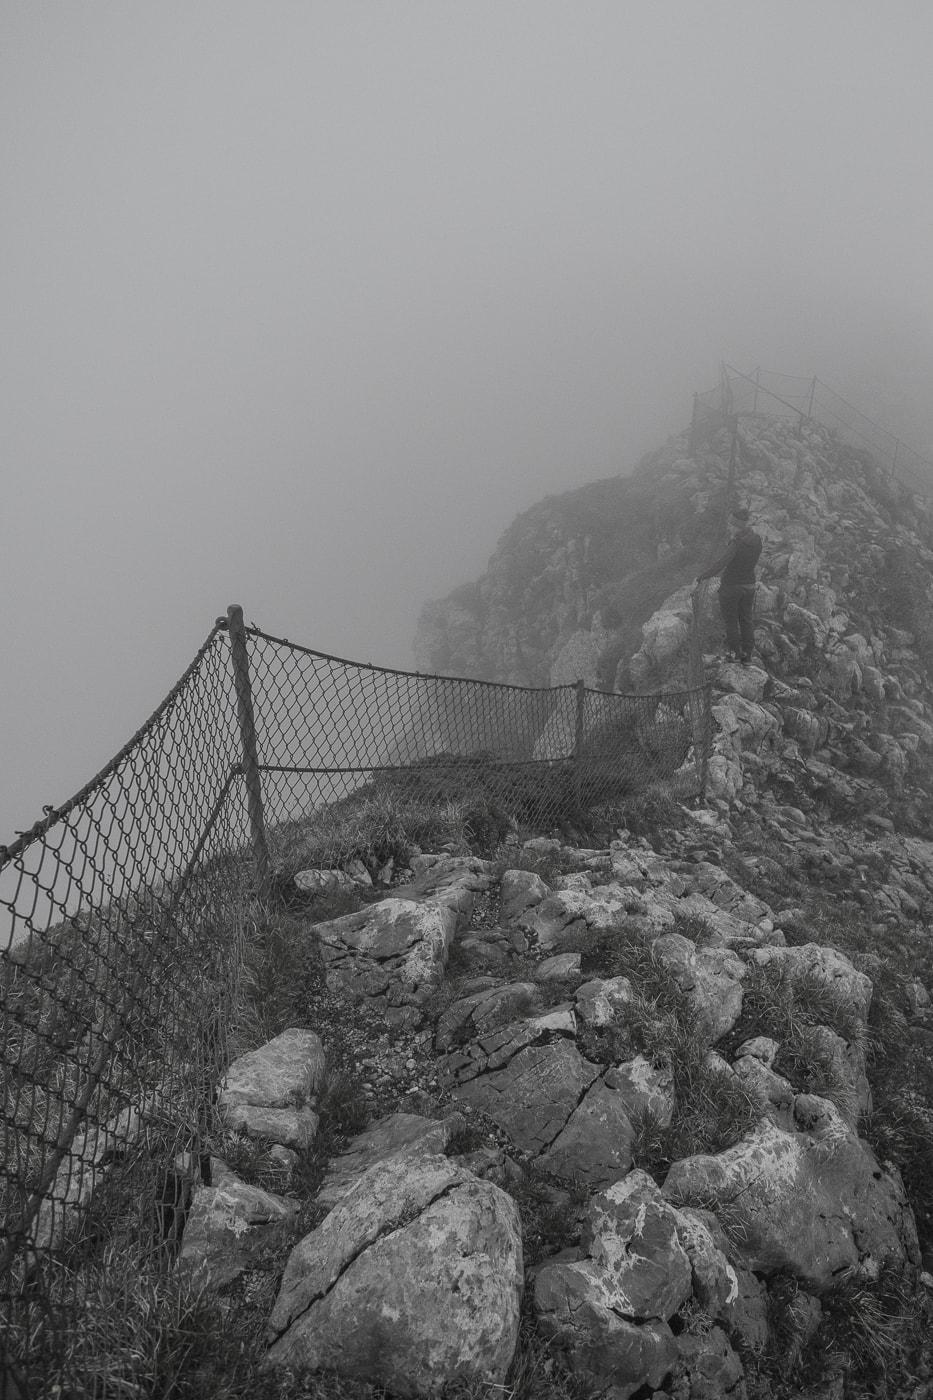 stockhorn gipfel nebel